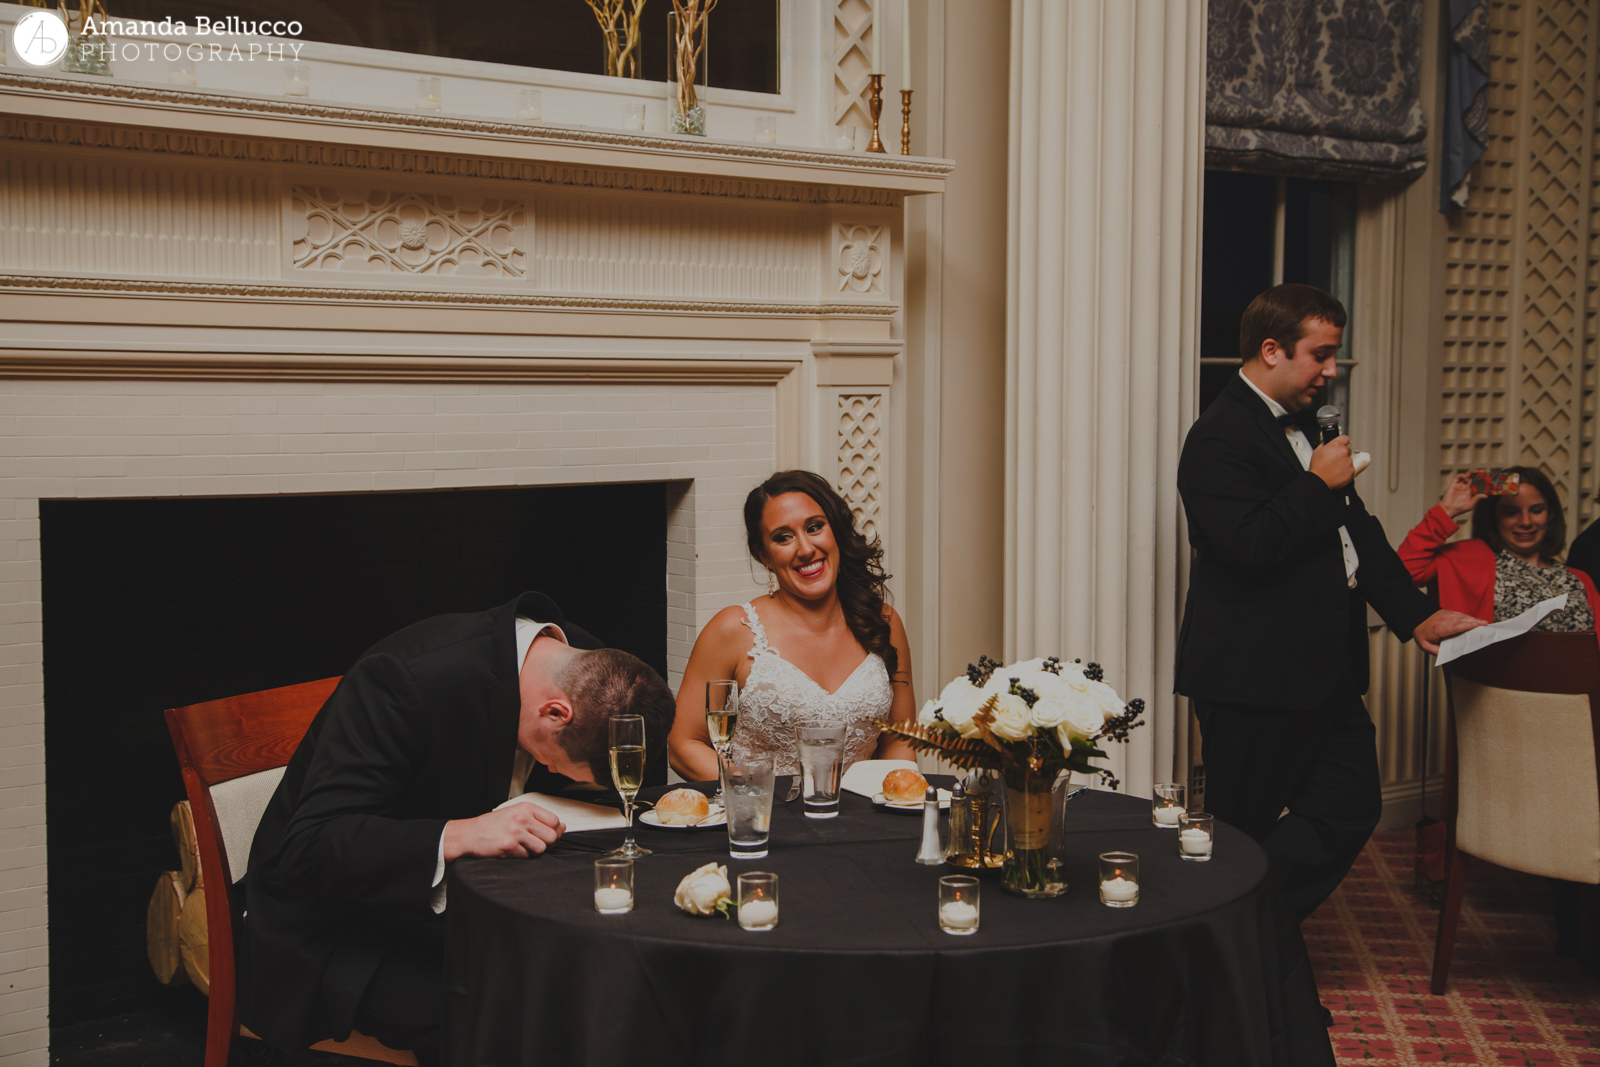 syracuse-rochester-fine-art-wedding-photographer-150.JPG